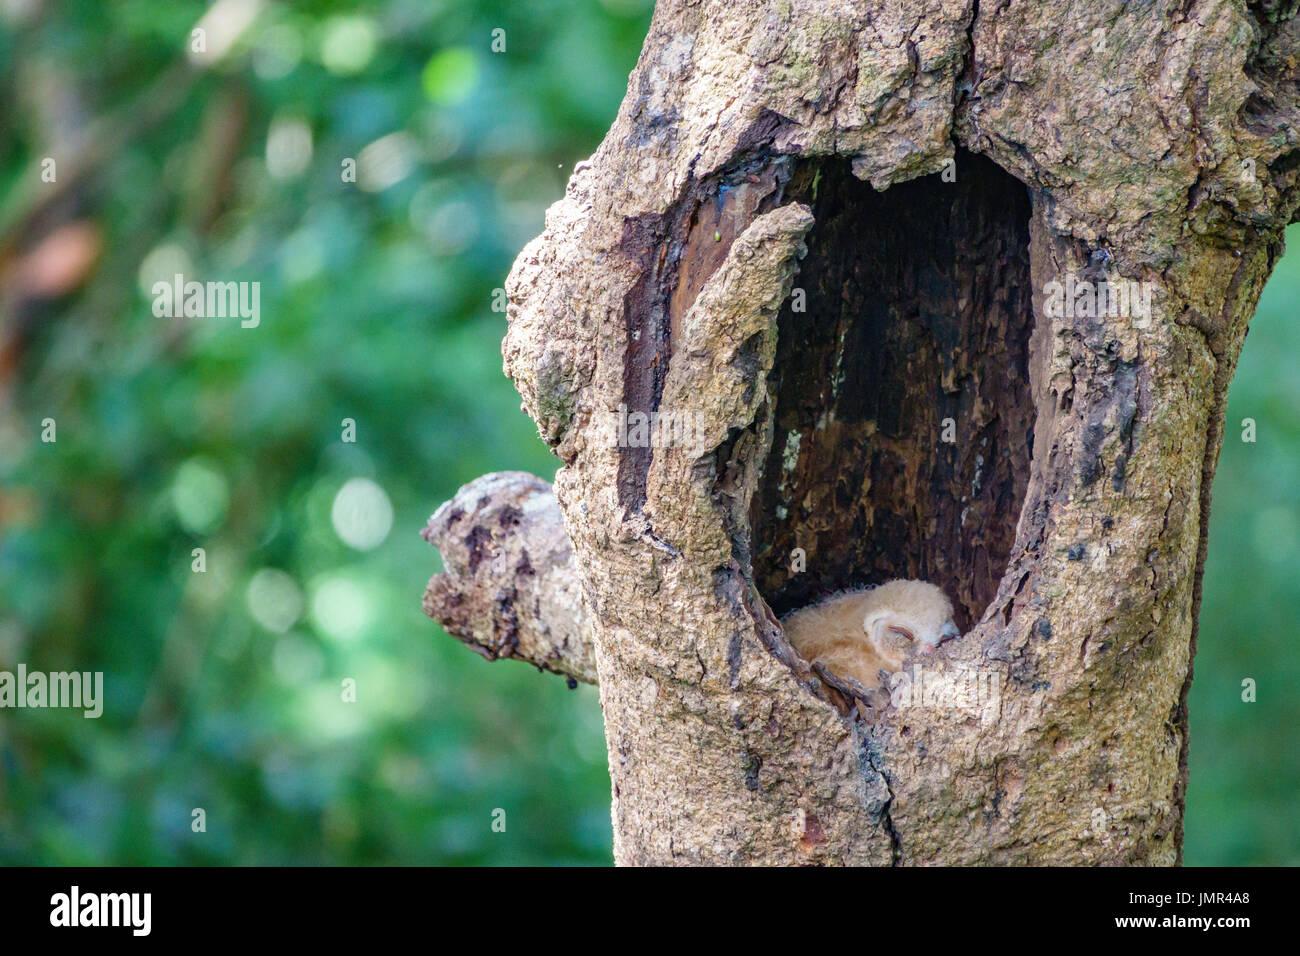 Baby Owls Sleeping Inside Tree Hole Stock Photo Alamy